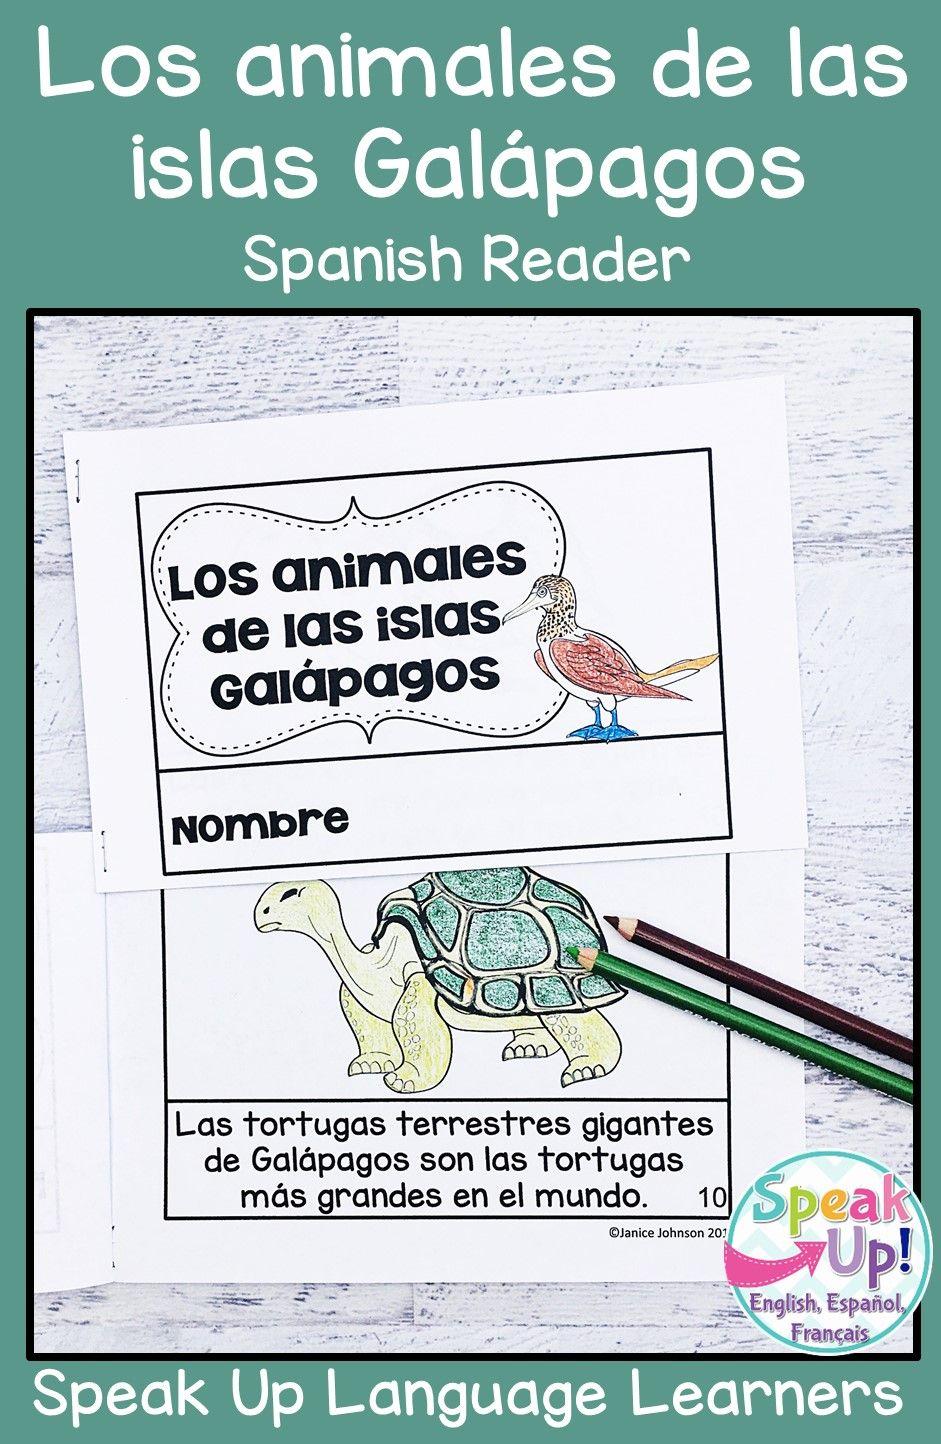 Los Animales De Las Islas Galapagos Reader Comprehension Activities En Espano Galapagos Islands How To Speak Spanish Spanish Speaking Countries Activities [ 1444 x 941 Pixel ]